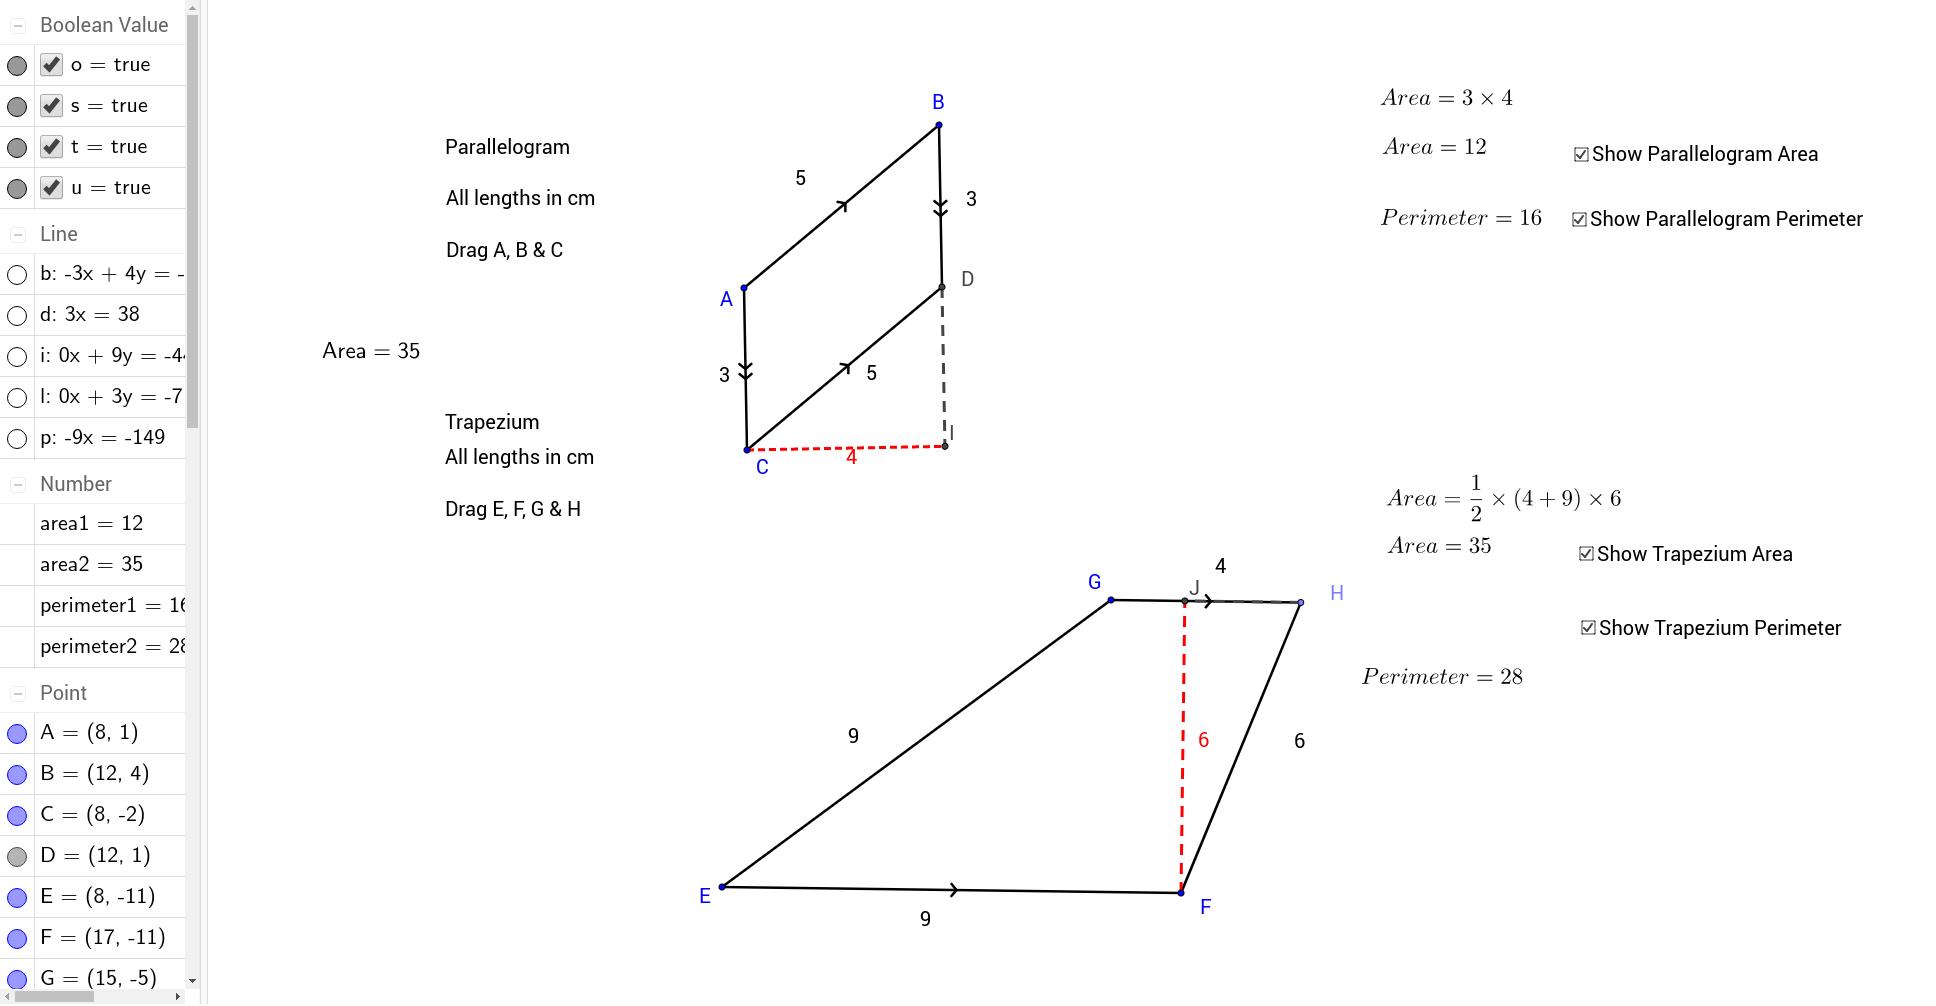 Worksheets Area Of A Parallelogram Worksheet parallelogram trapezium area perimeter geogebra applet